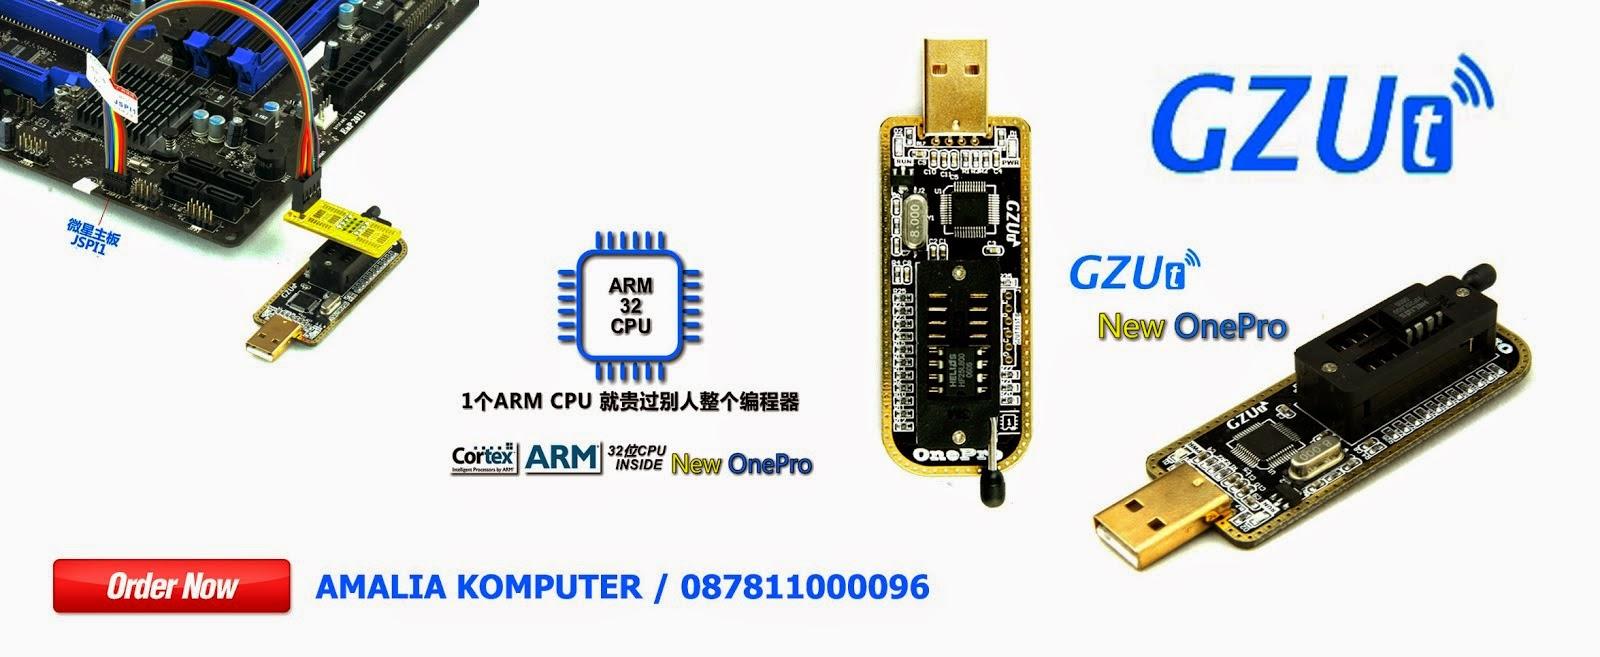 GZUT One Pro Flasher